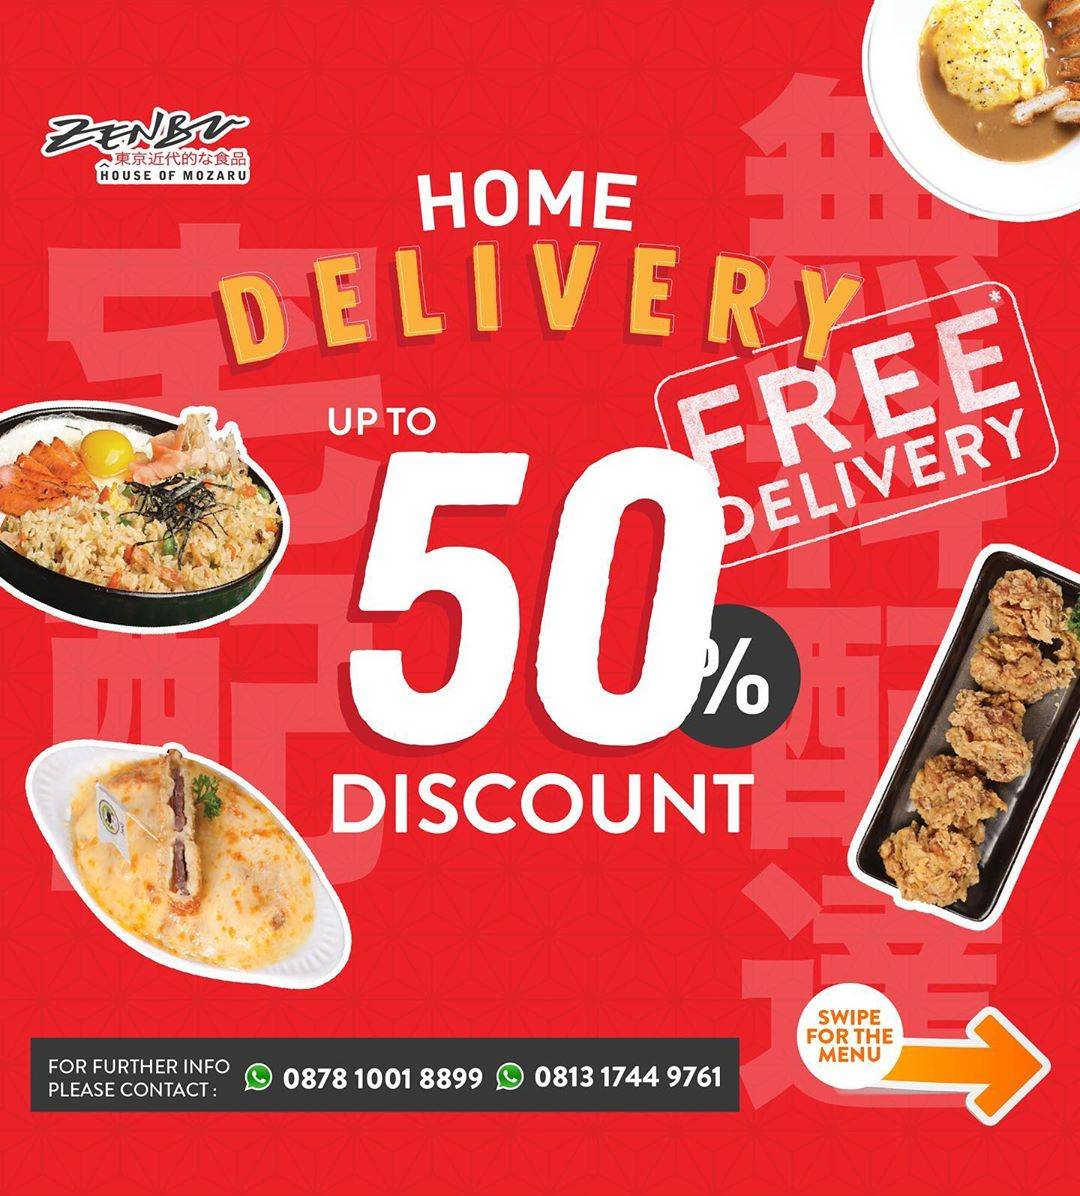 Diskon Zenbu Promo Home Delivery, Diskon Hingga 50% + Free Delivery